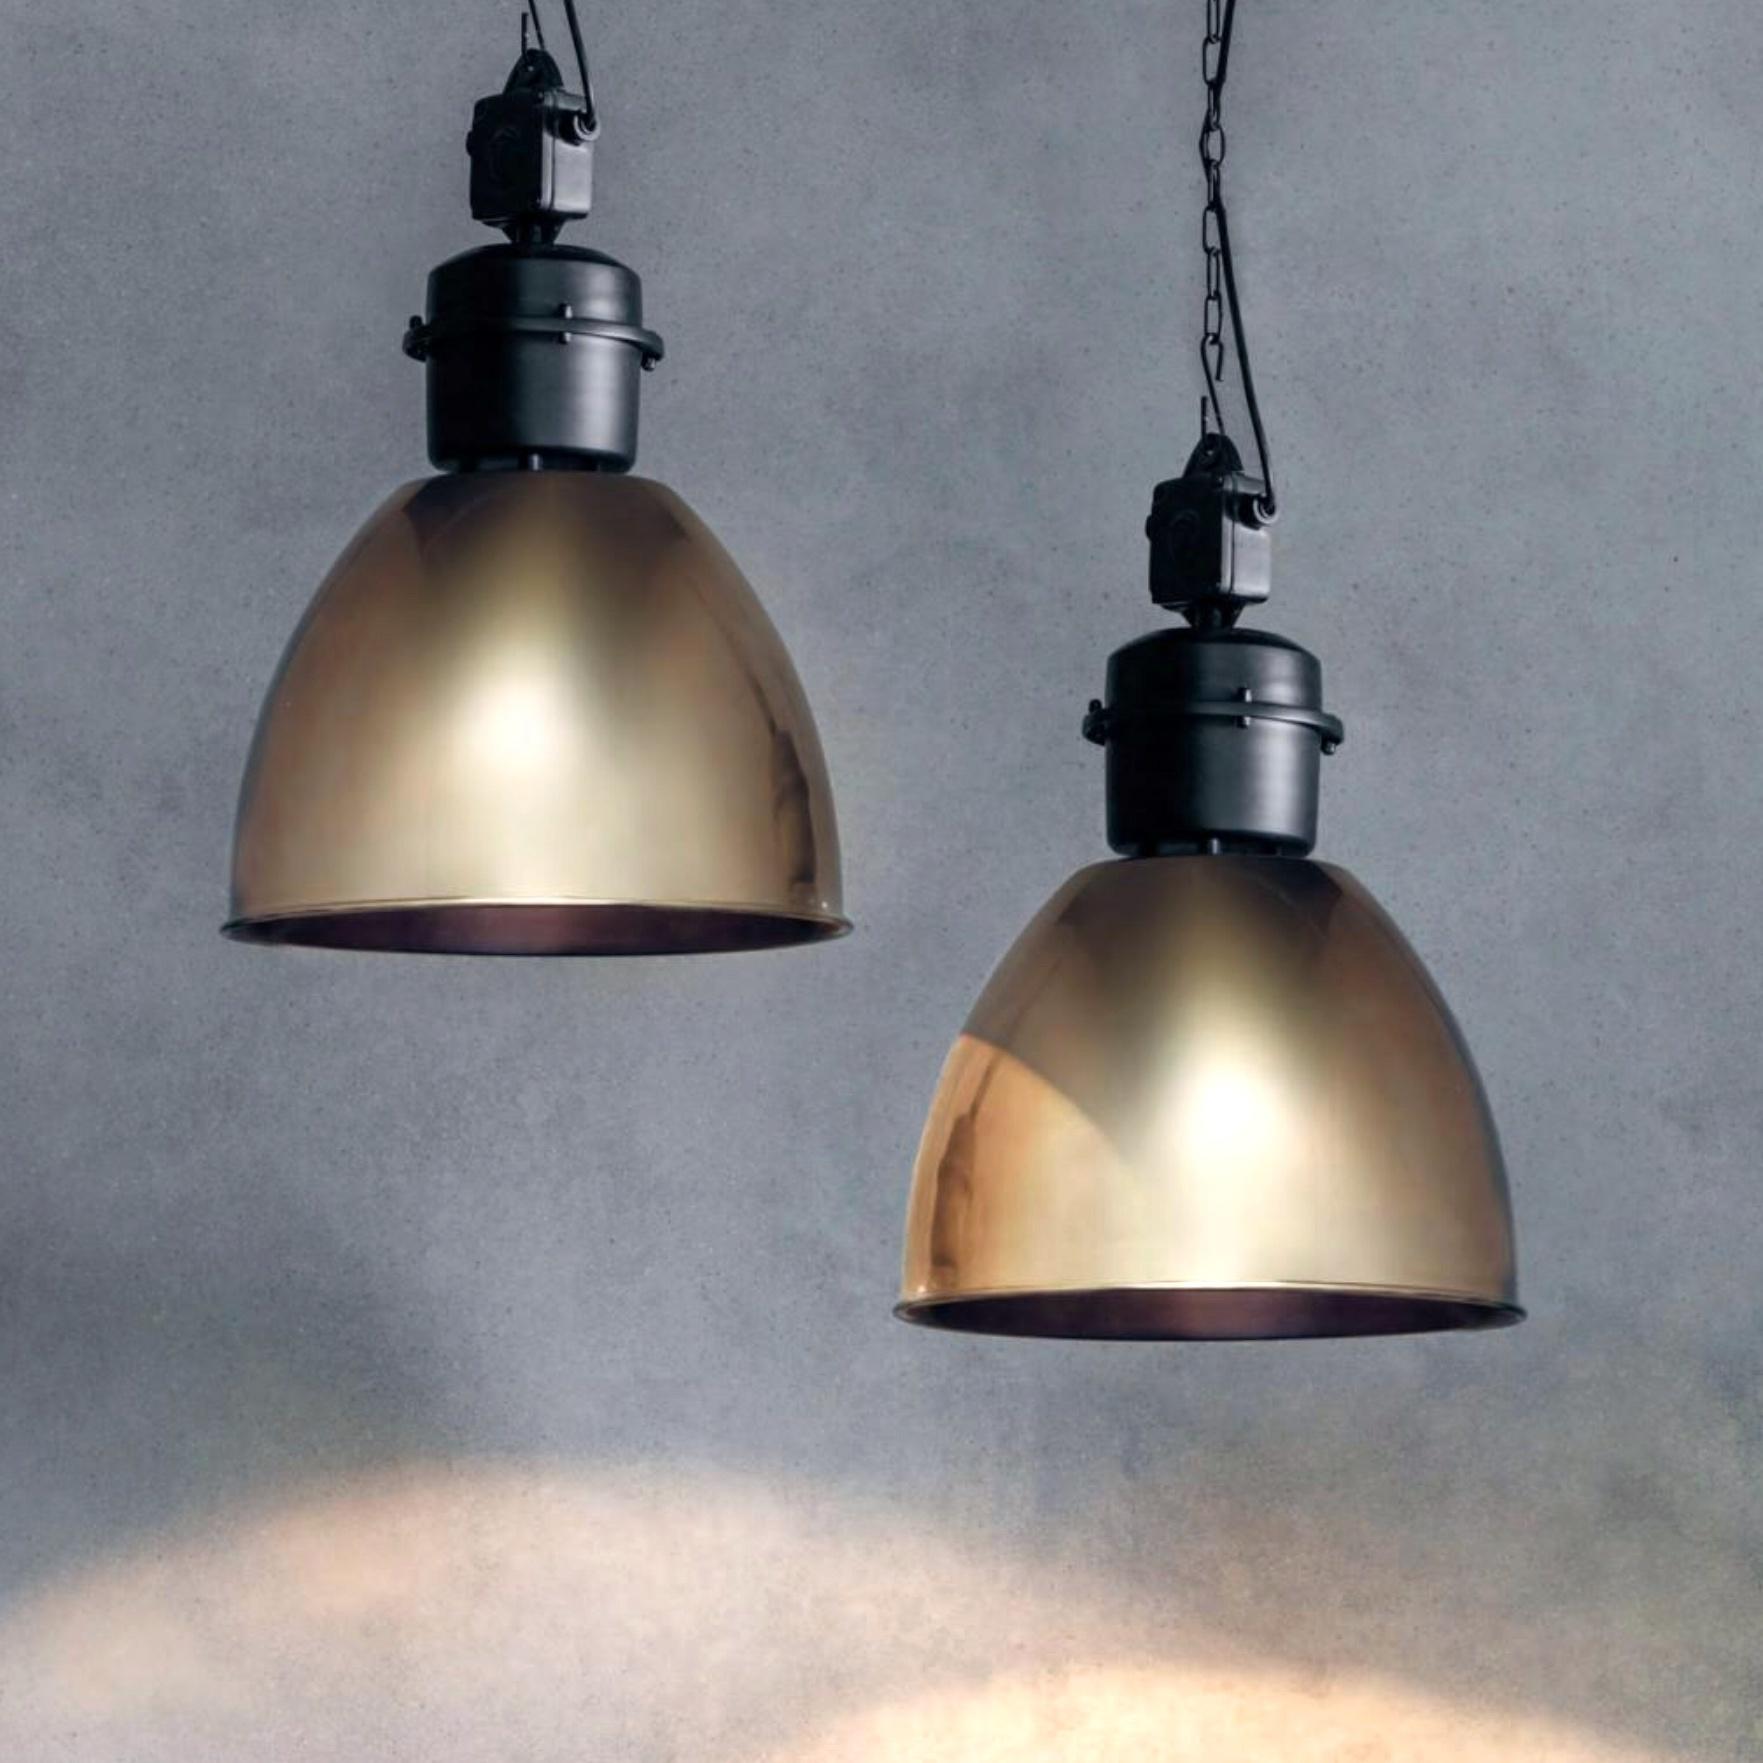 08893e019f Industrial Factory Pendant - Antique Brass & Matt Black - Large ...